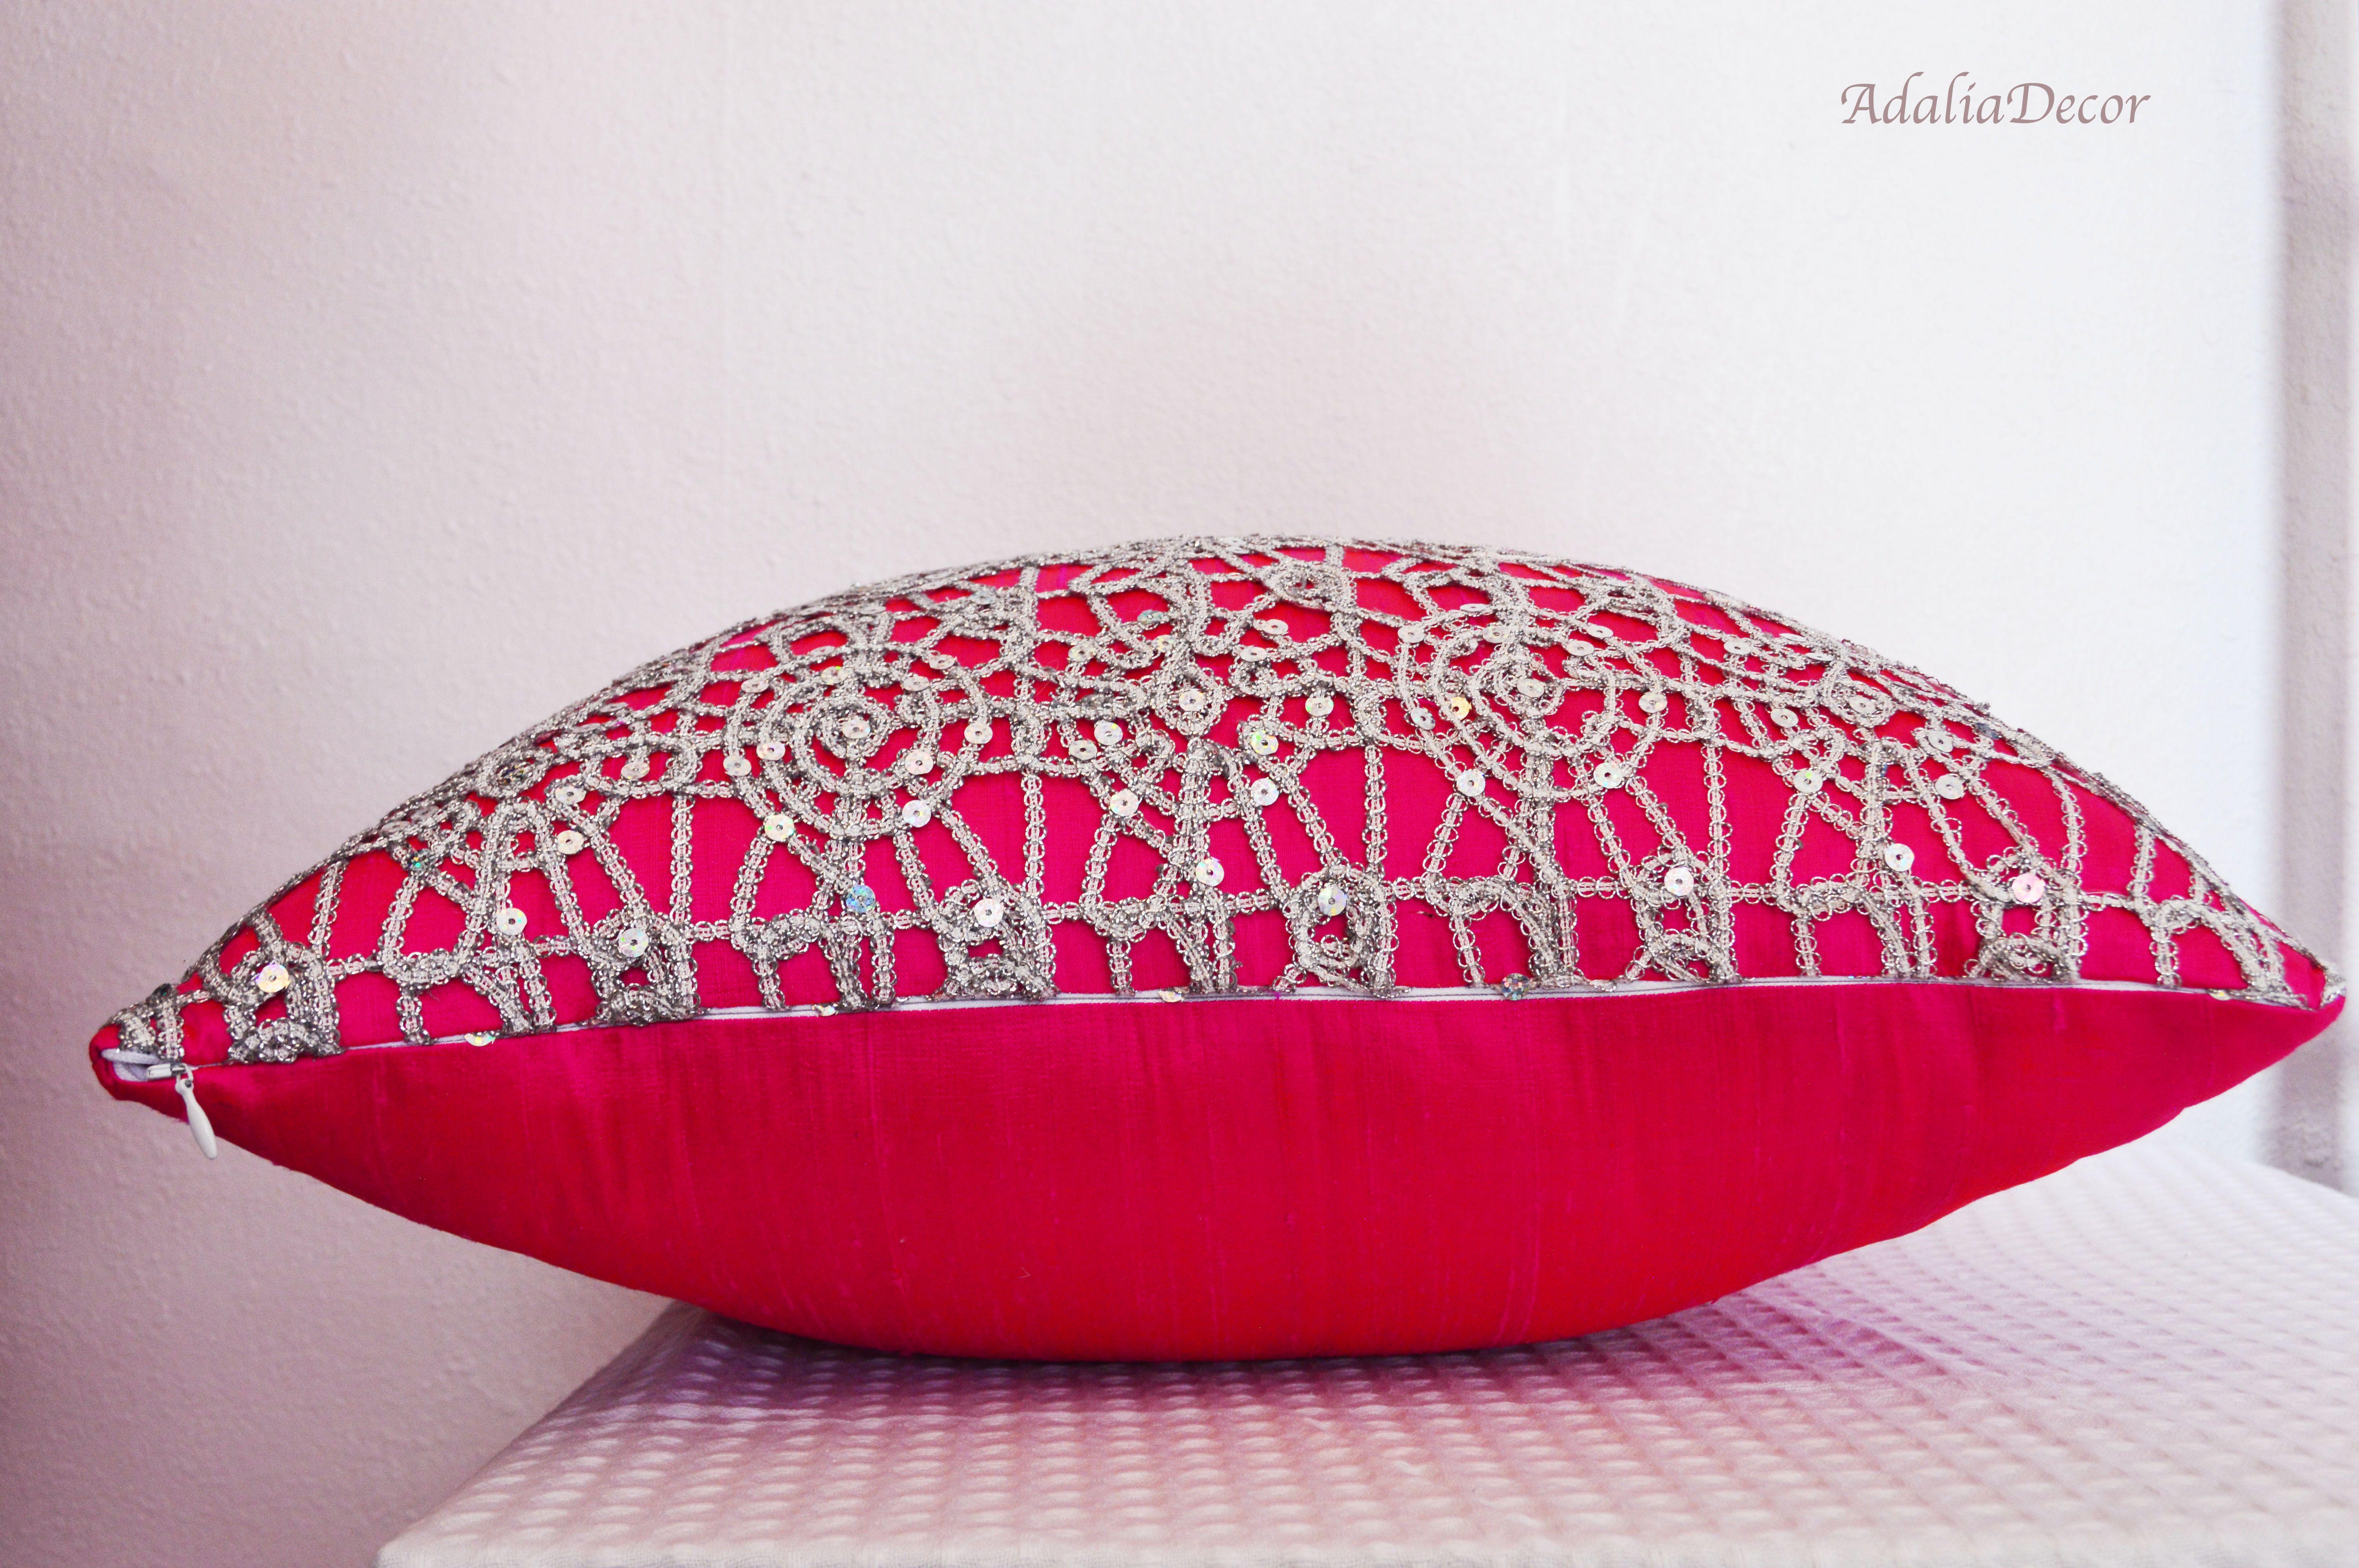 "Pink Pillow. Pink Silk Pillow. Lace Pillow 20 x 20""  Victorian Lace Pillow. Handmade. #Home #DecorativePillows #ThrowPillows #AccentPillows #Homedecor #Housewares #Pillowcovers #Design #Homedesign #Art #FunctionalArt #FamilyRoom #DesignerPillows #BedPillow #CouchPillow #BeautifulHome #PillowCover #Pinkpillow #Pinkdecorativepillow #pinkhomedecor #pink #fuchsia #lightpink #lightpinkdecor #victoriandecor #pearl"